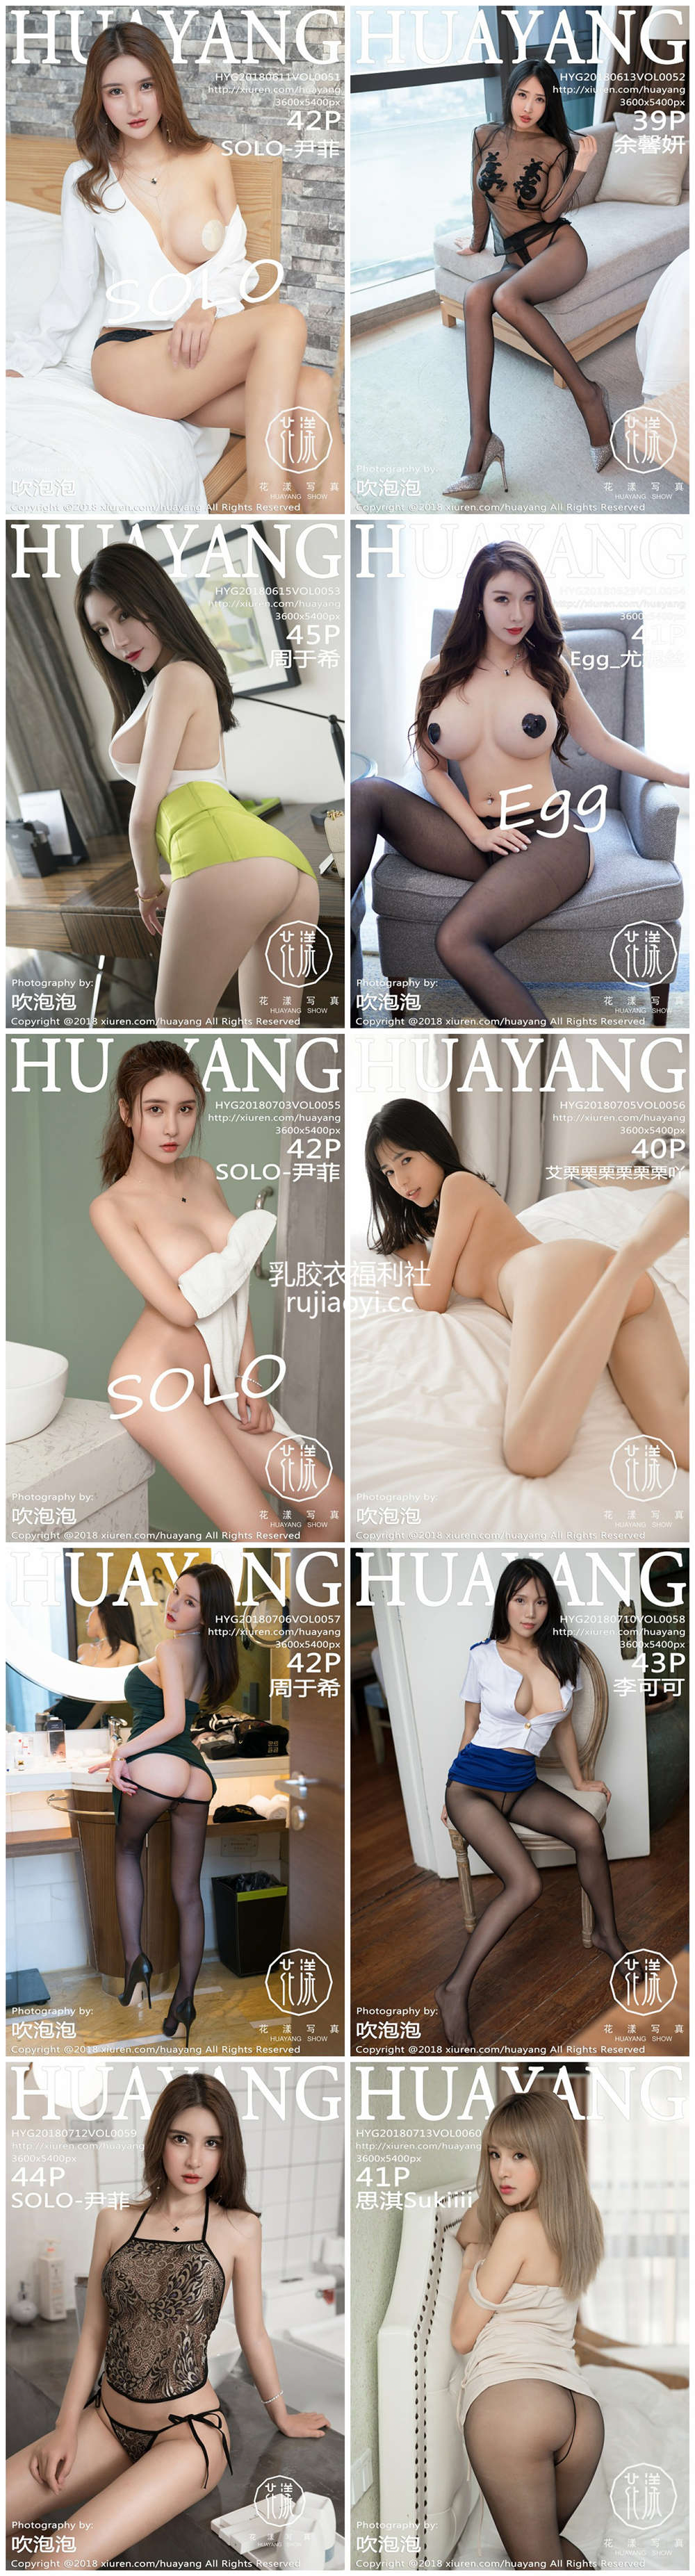 [HuaYang花漾] Vol.051-060 秀人系列 10期性感写真百度云合集下载